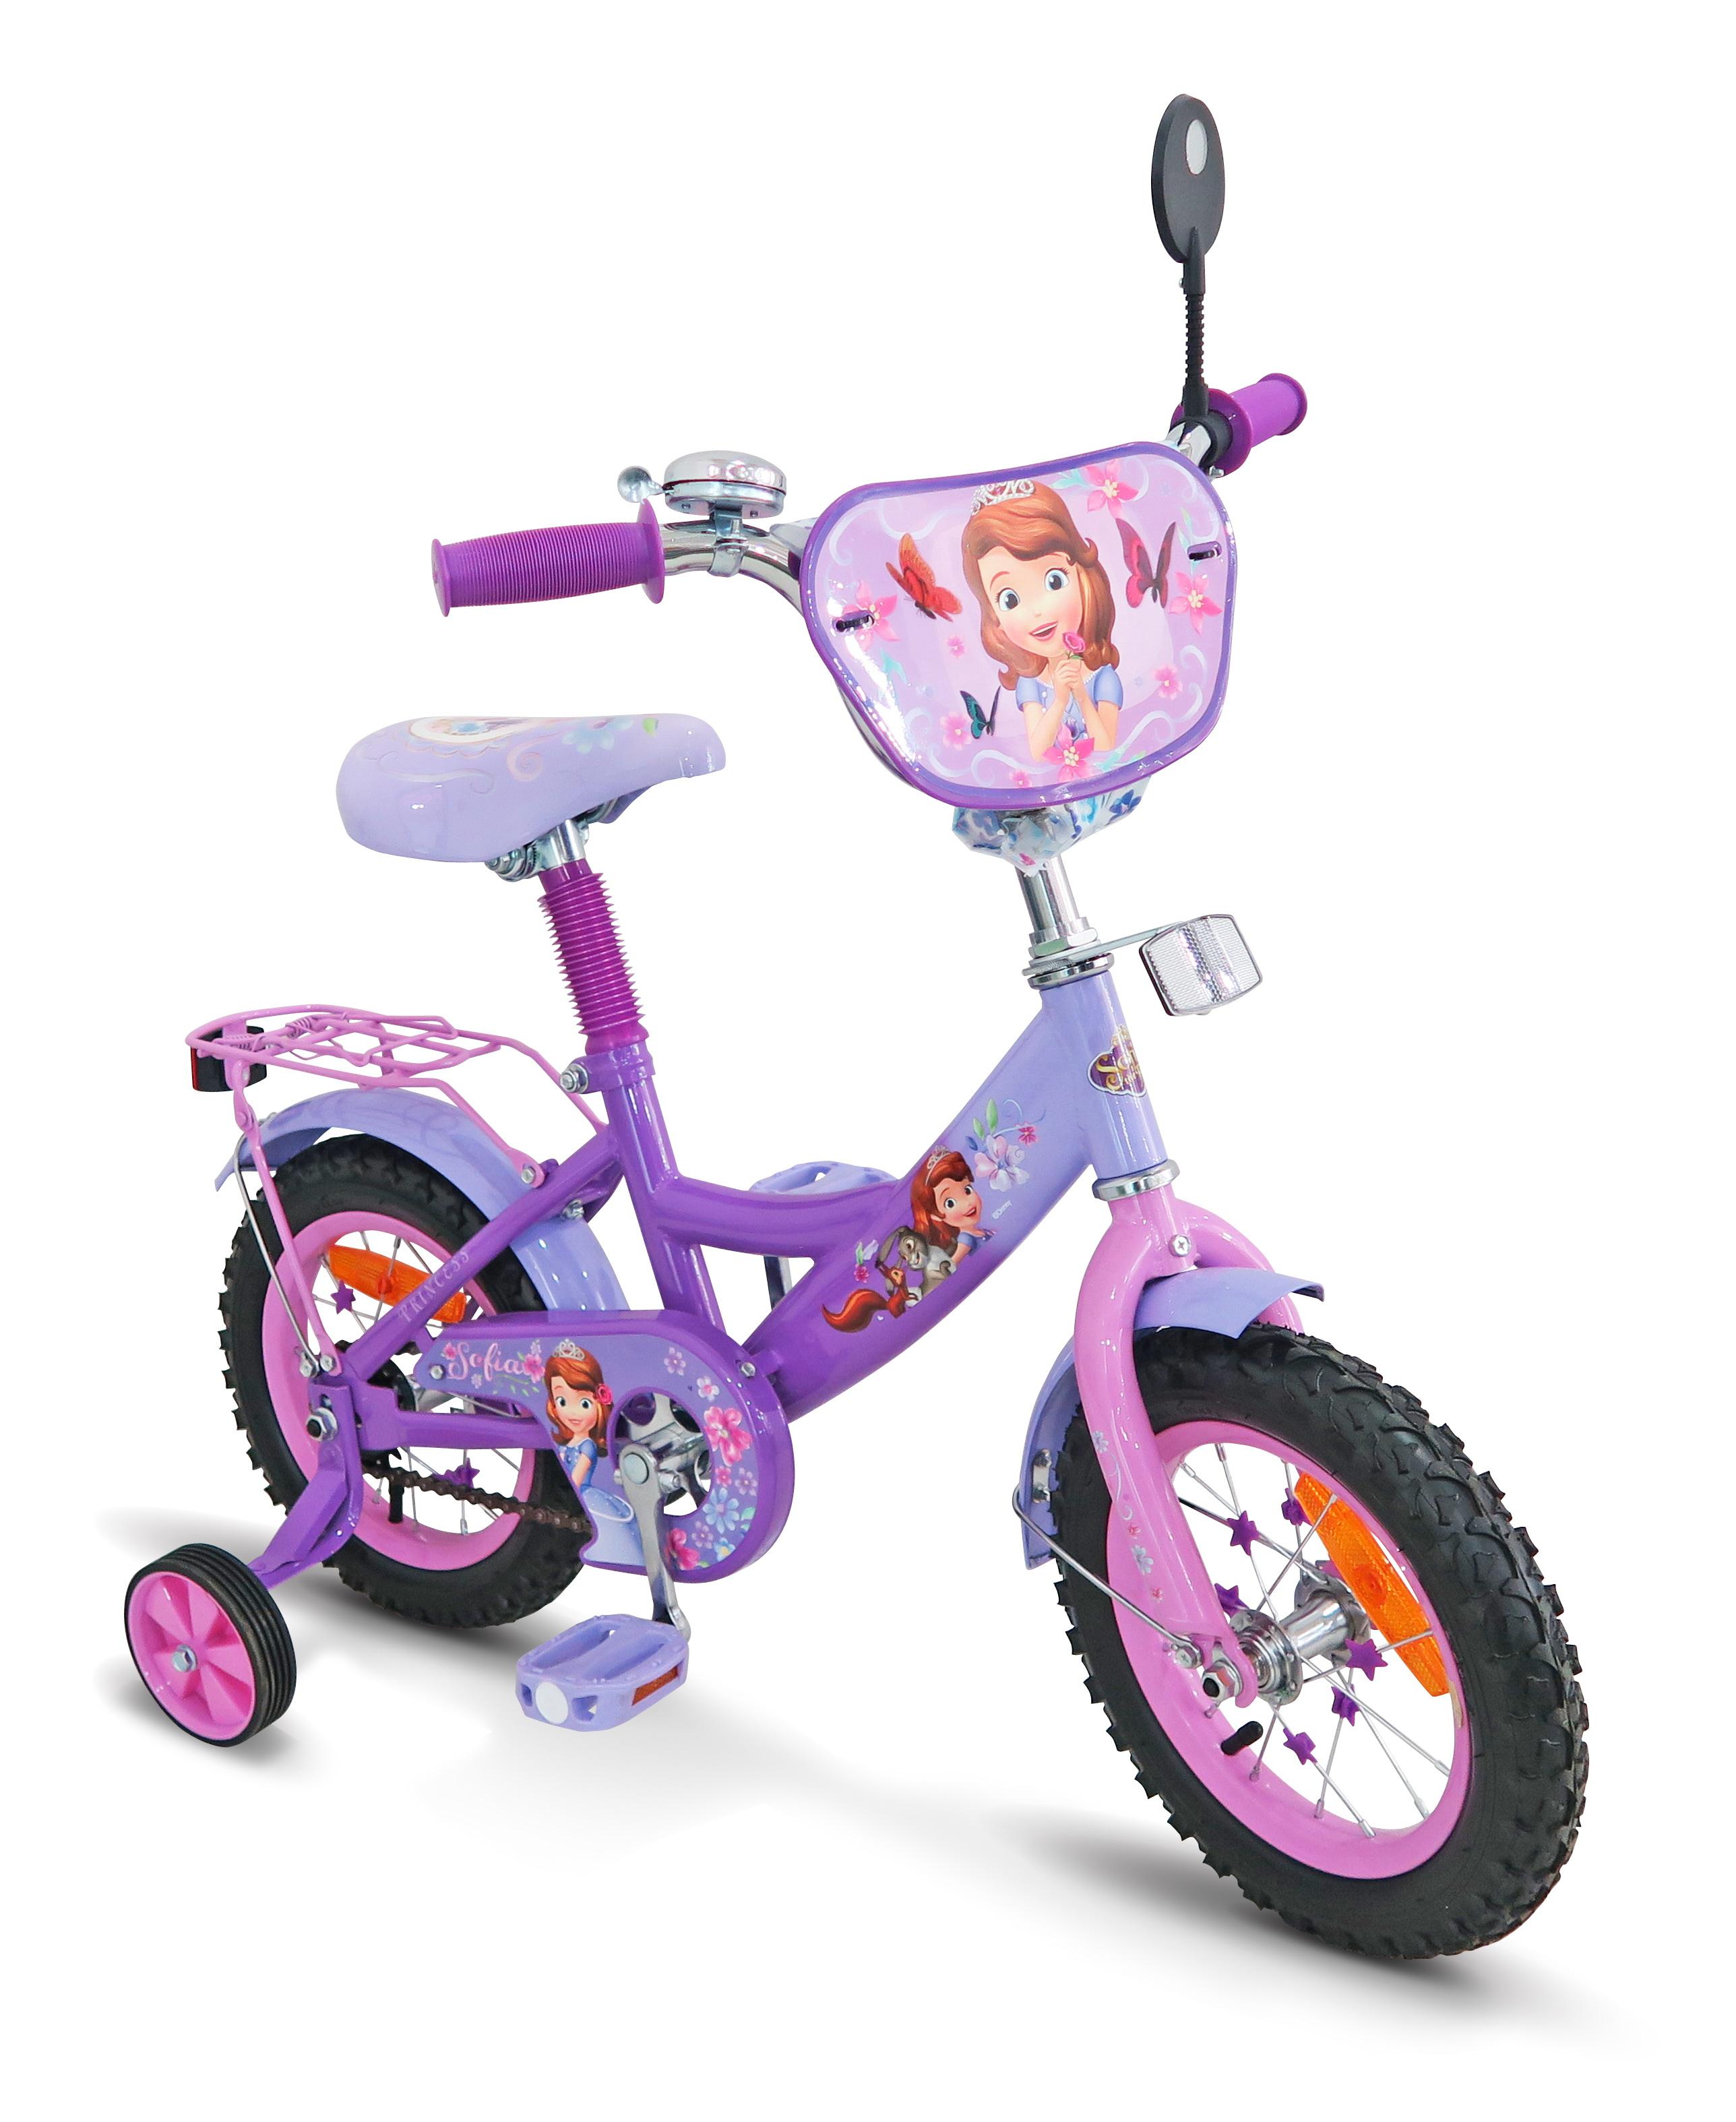 Велосипед Disney/Sofia the First Артикул:SP1201 (2-х колесный)